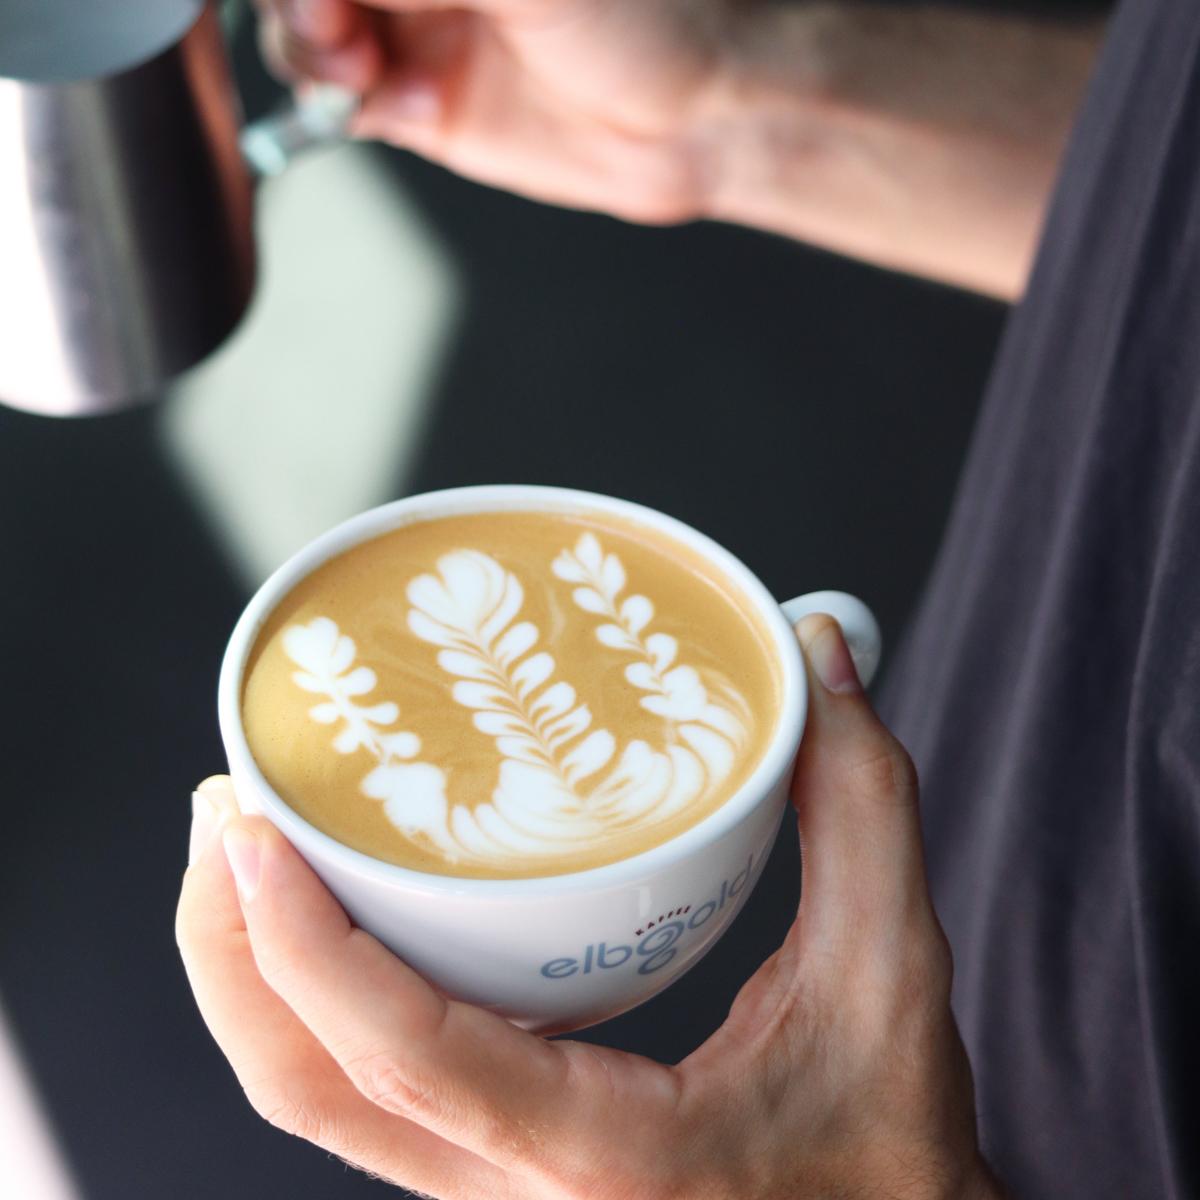 Elbgold Coffee Bar Hamburg Innenstadt-6